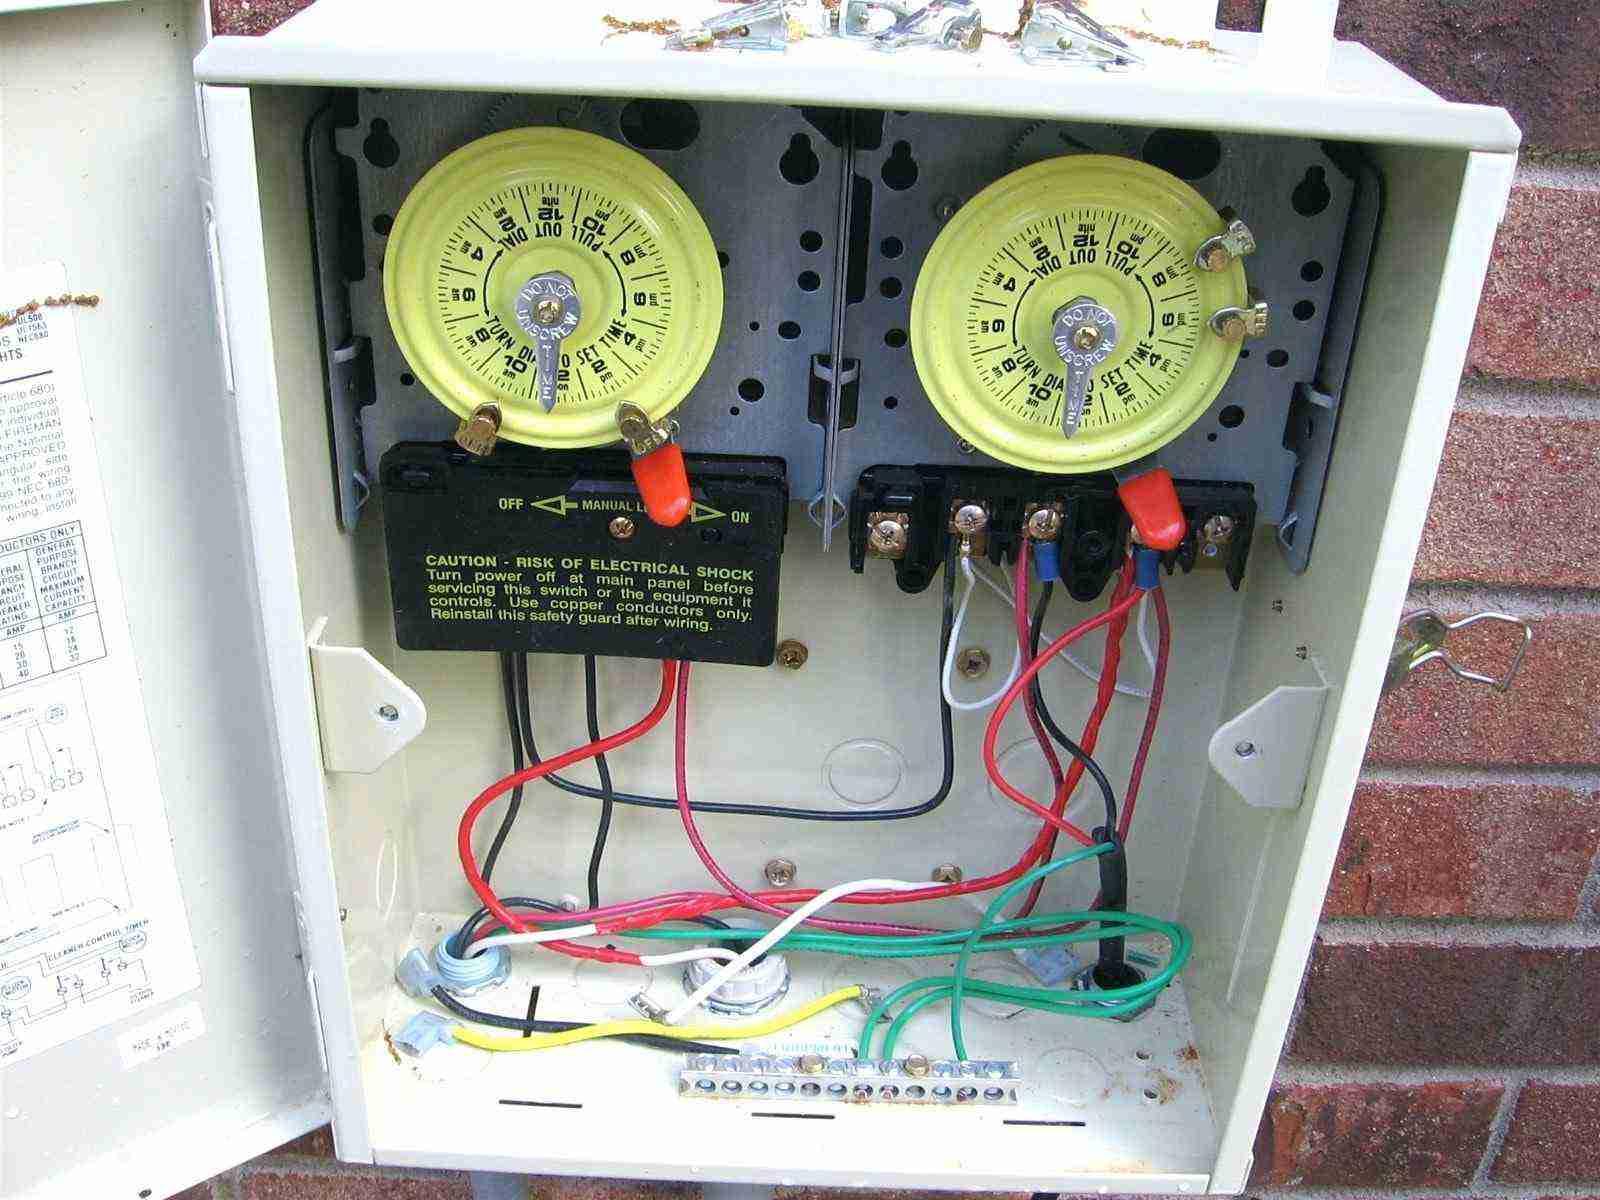 Intermatic Pool Pump Timer Wiring Diagram | Wiring Diagram - Intermatic Pool Timer Wiring Diagram